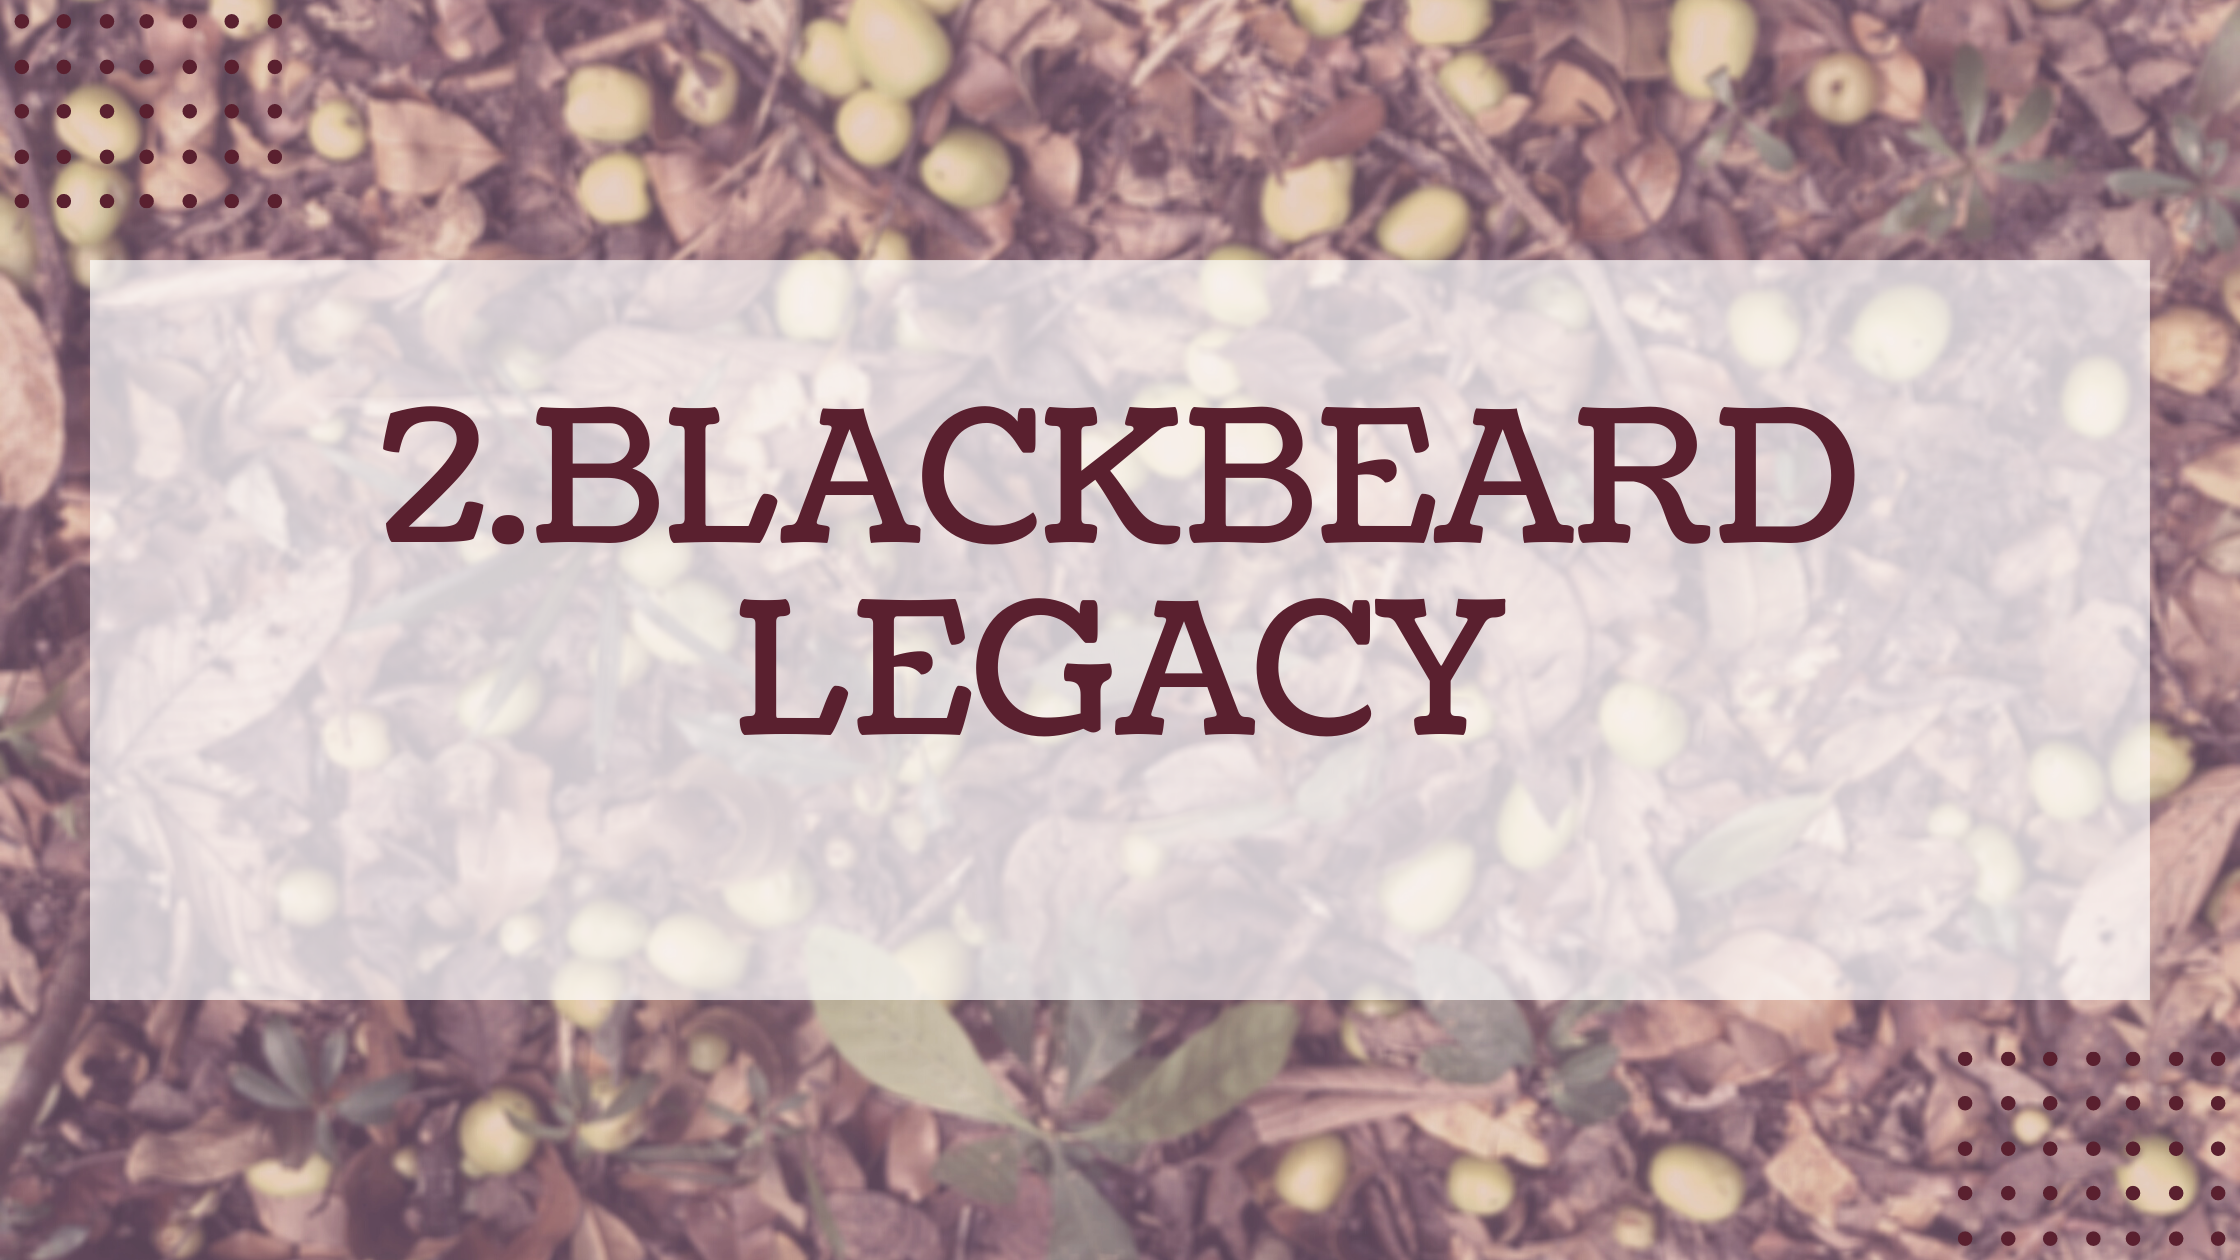 2.Blackbeard Legacy